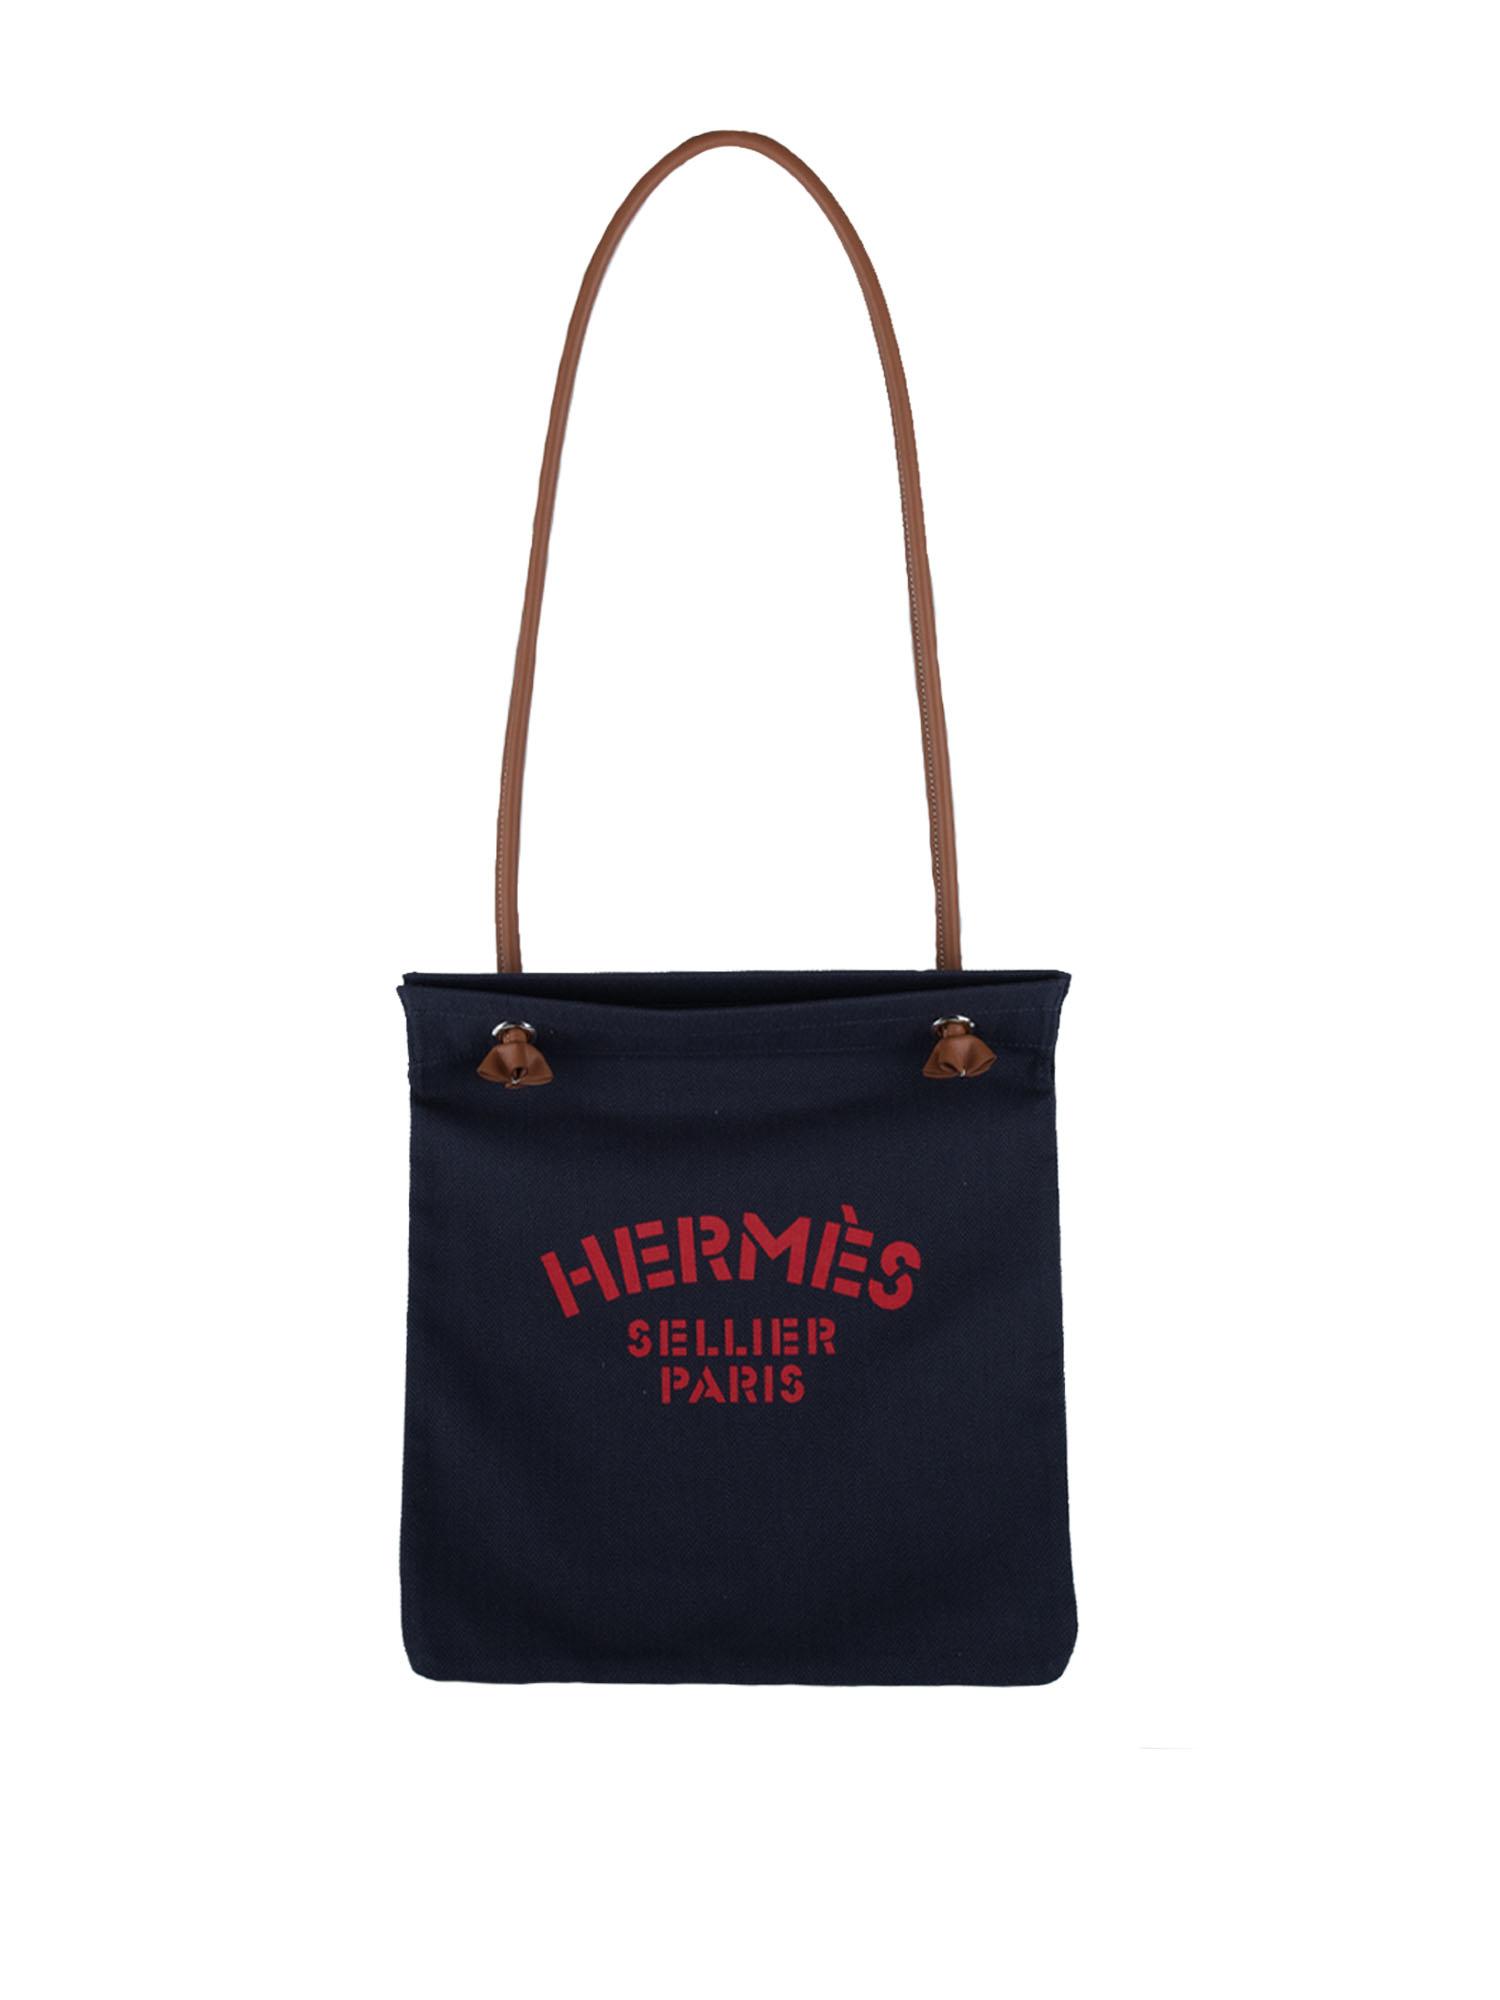 Hermes ถุงผ้าลดโลกร้อนArtboard 1